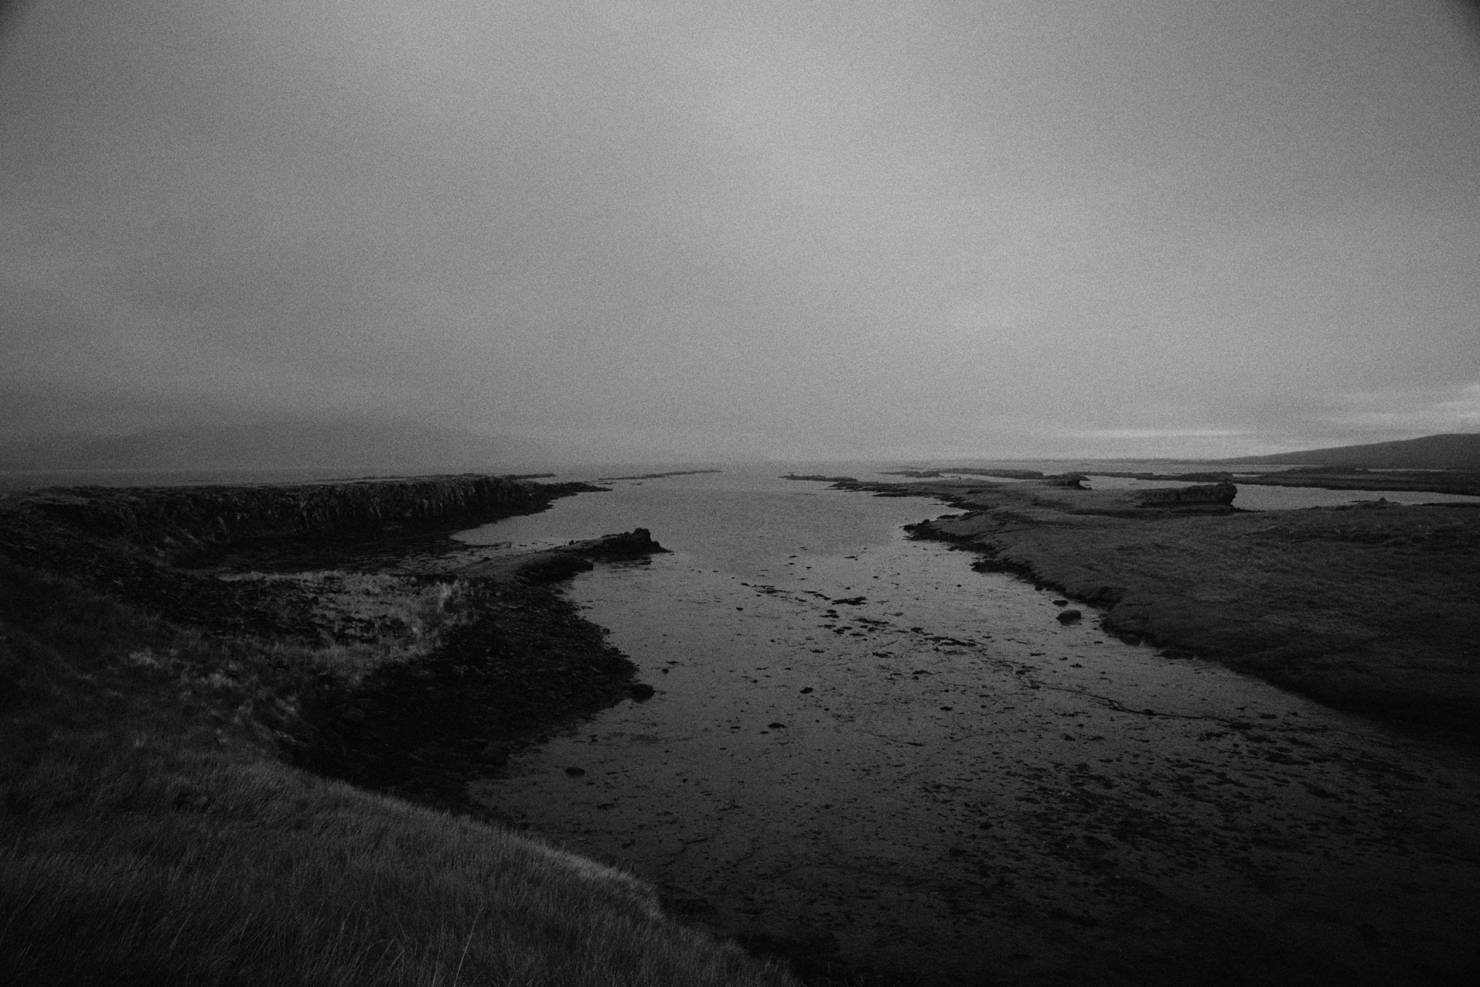 patrick_schuttler_landscape_iceland_009-9792d8e814059db4a91f88e48a32a151